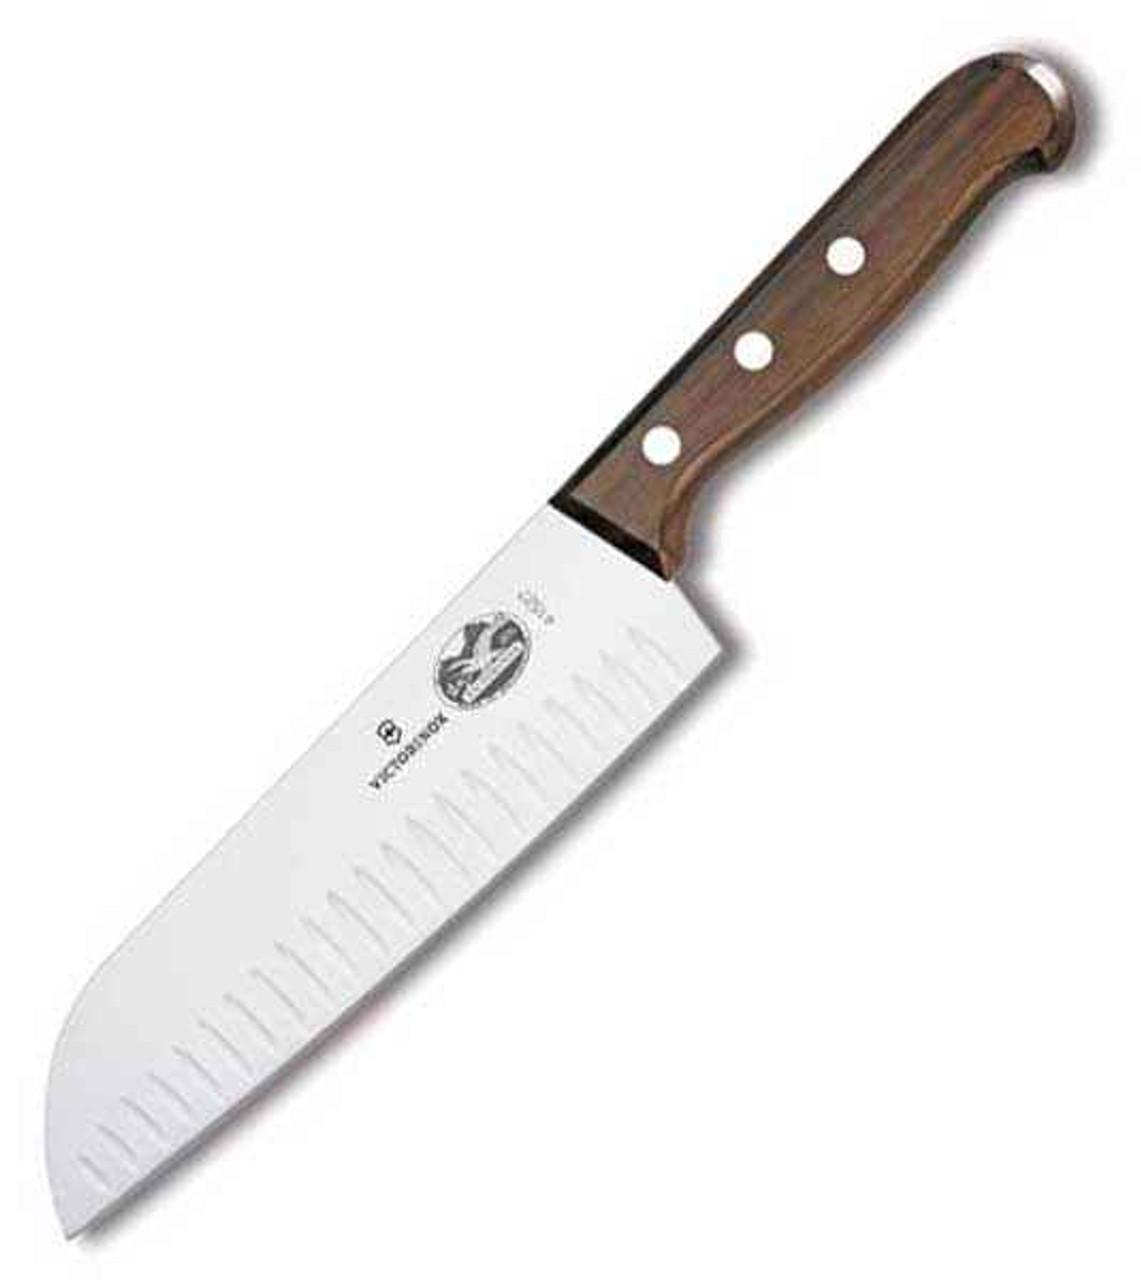 "Forschner 7"" Santoku Stamped Blade, Granton Edge, Rosewood Handle"